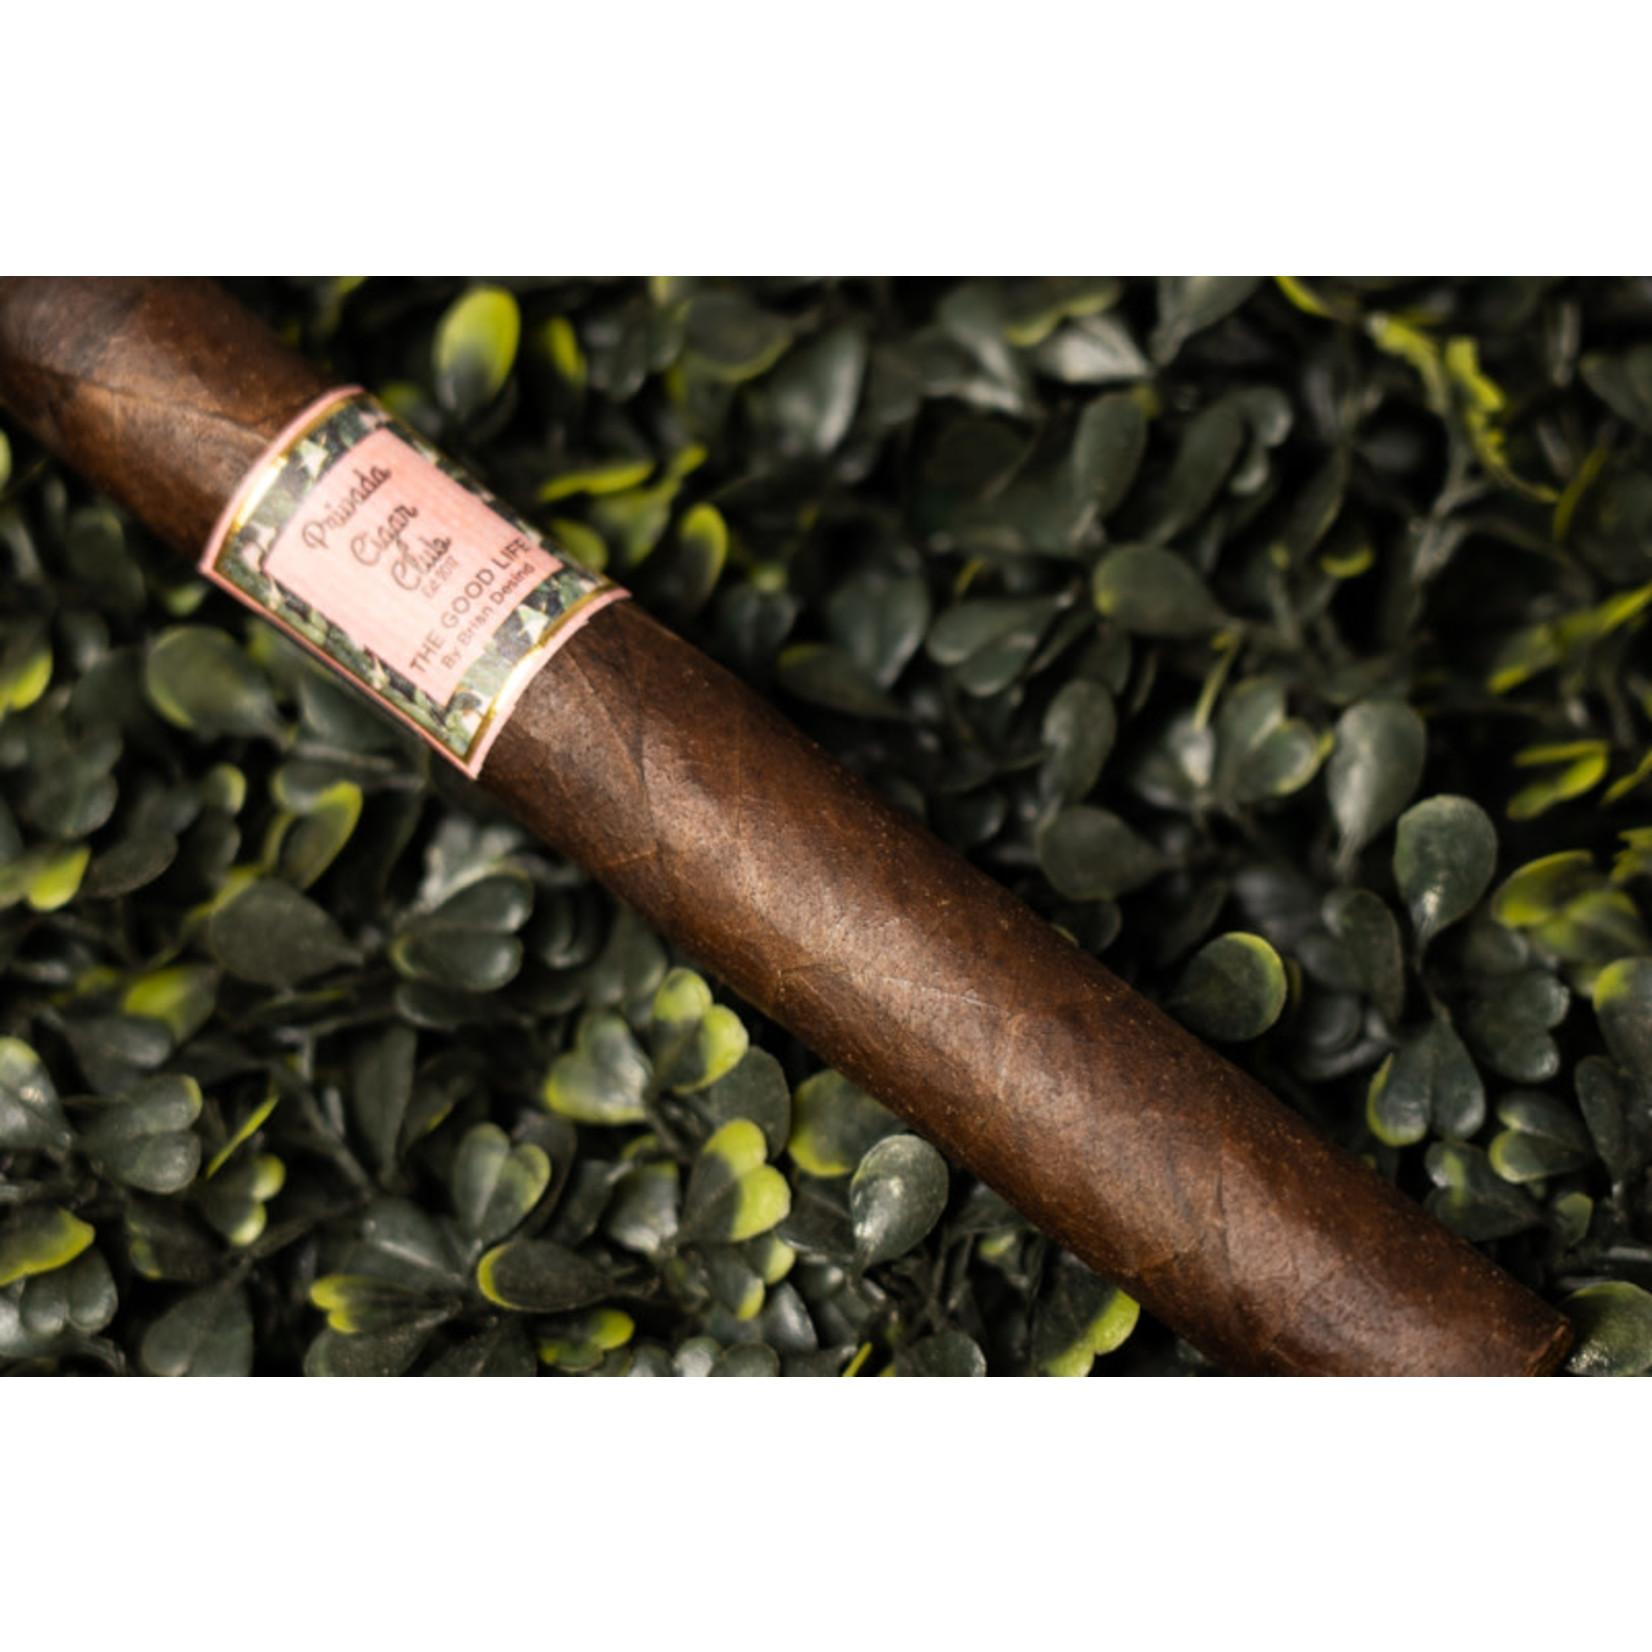 Privada Cigar Club The Good Life by Brian Desind (J.C. Newman)